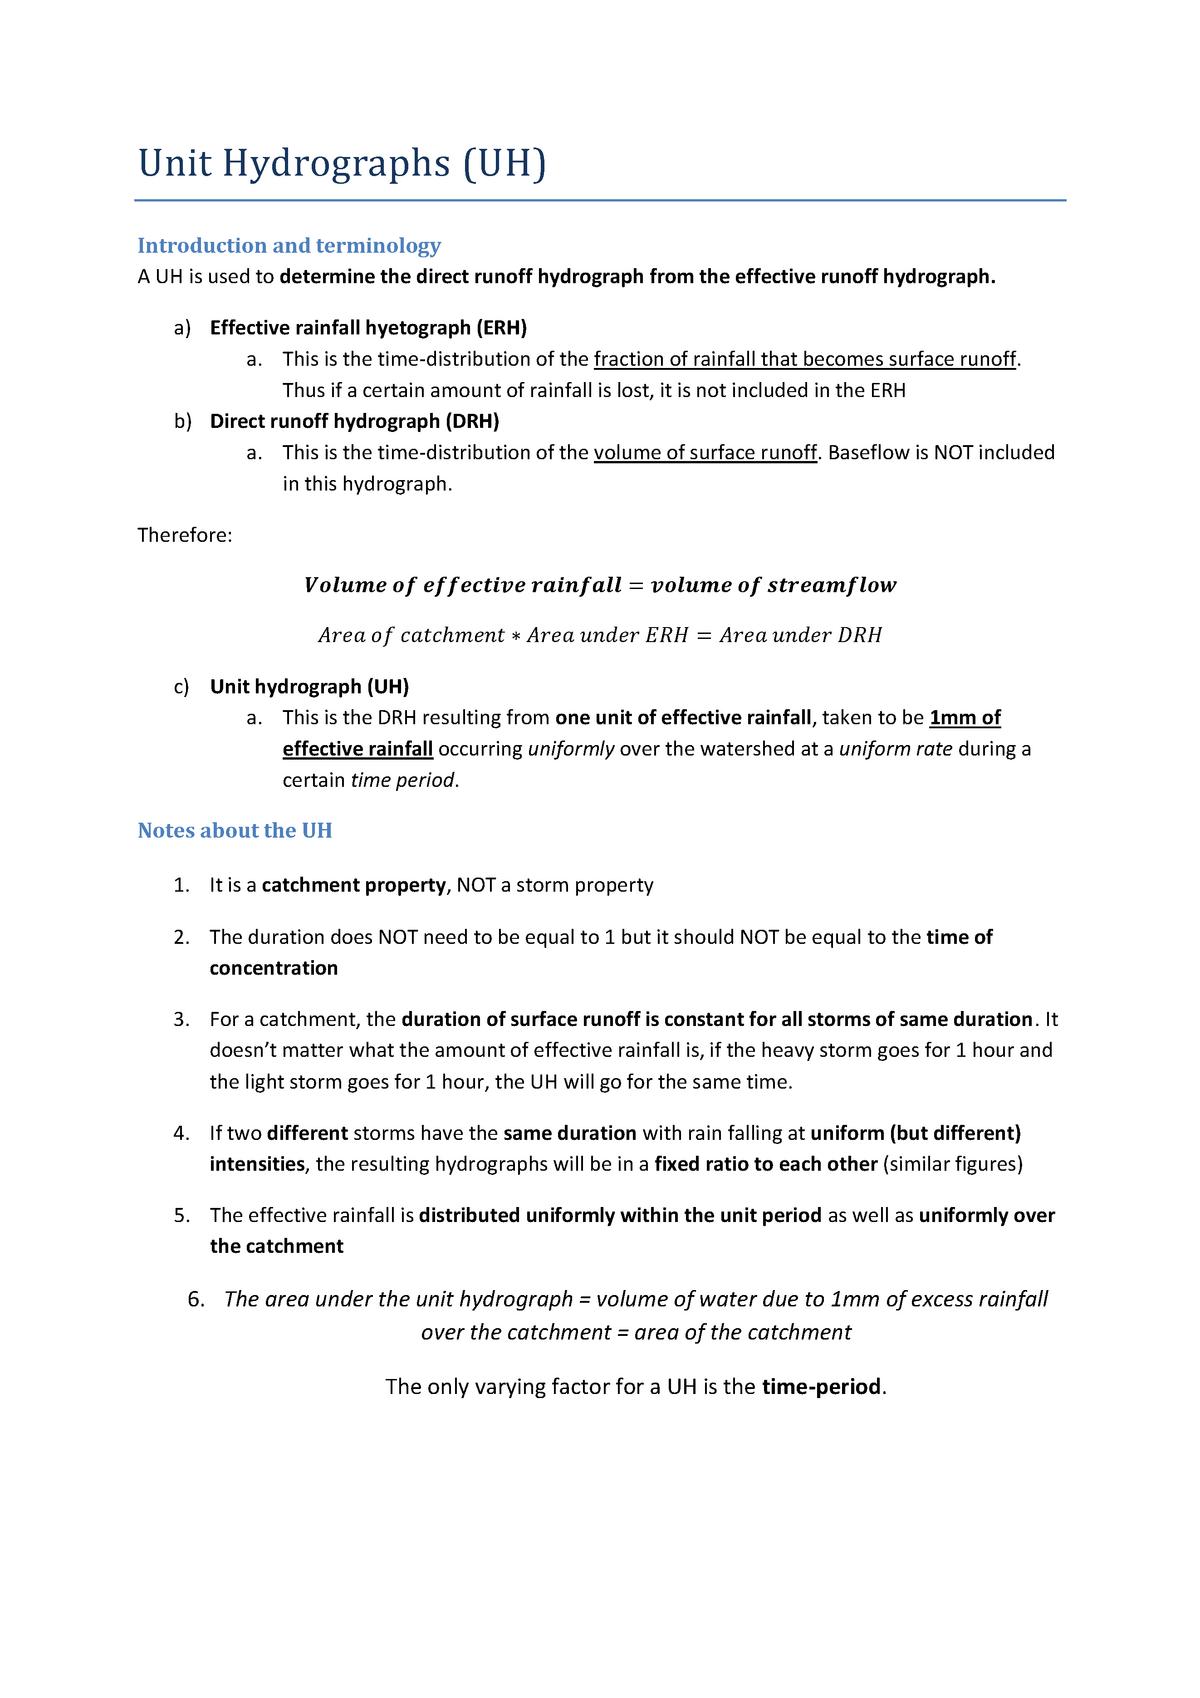 Summary - Extensive notes on Unit hydrographs - CVEN3501